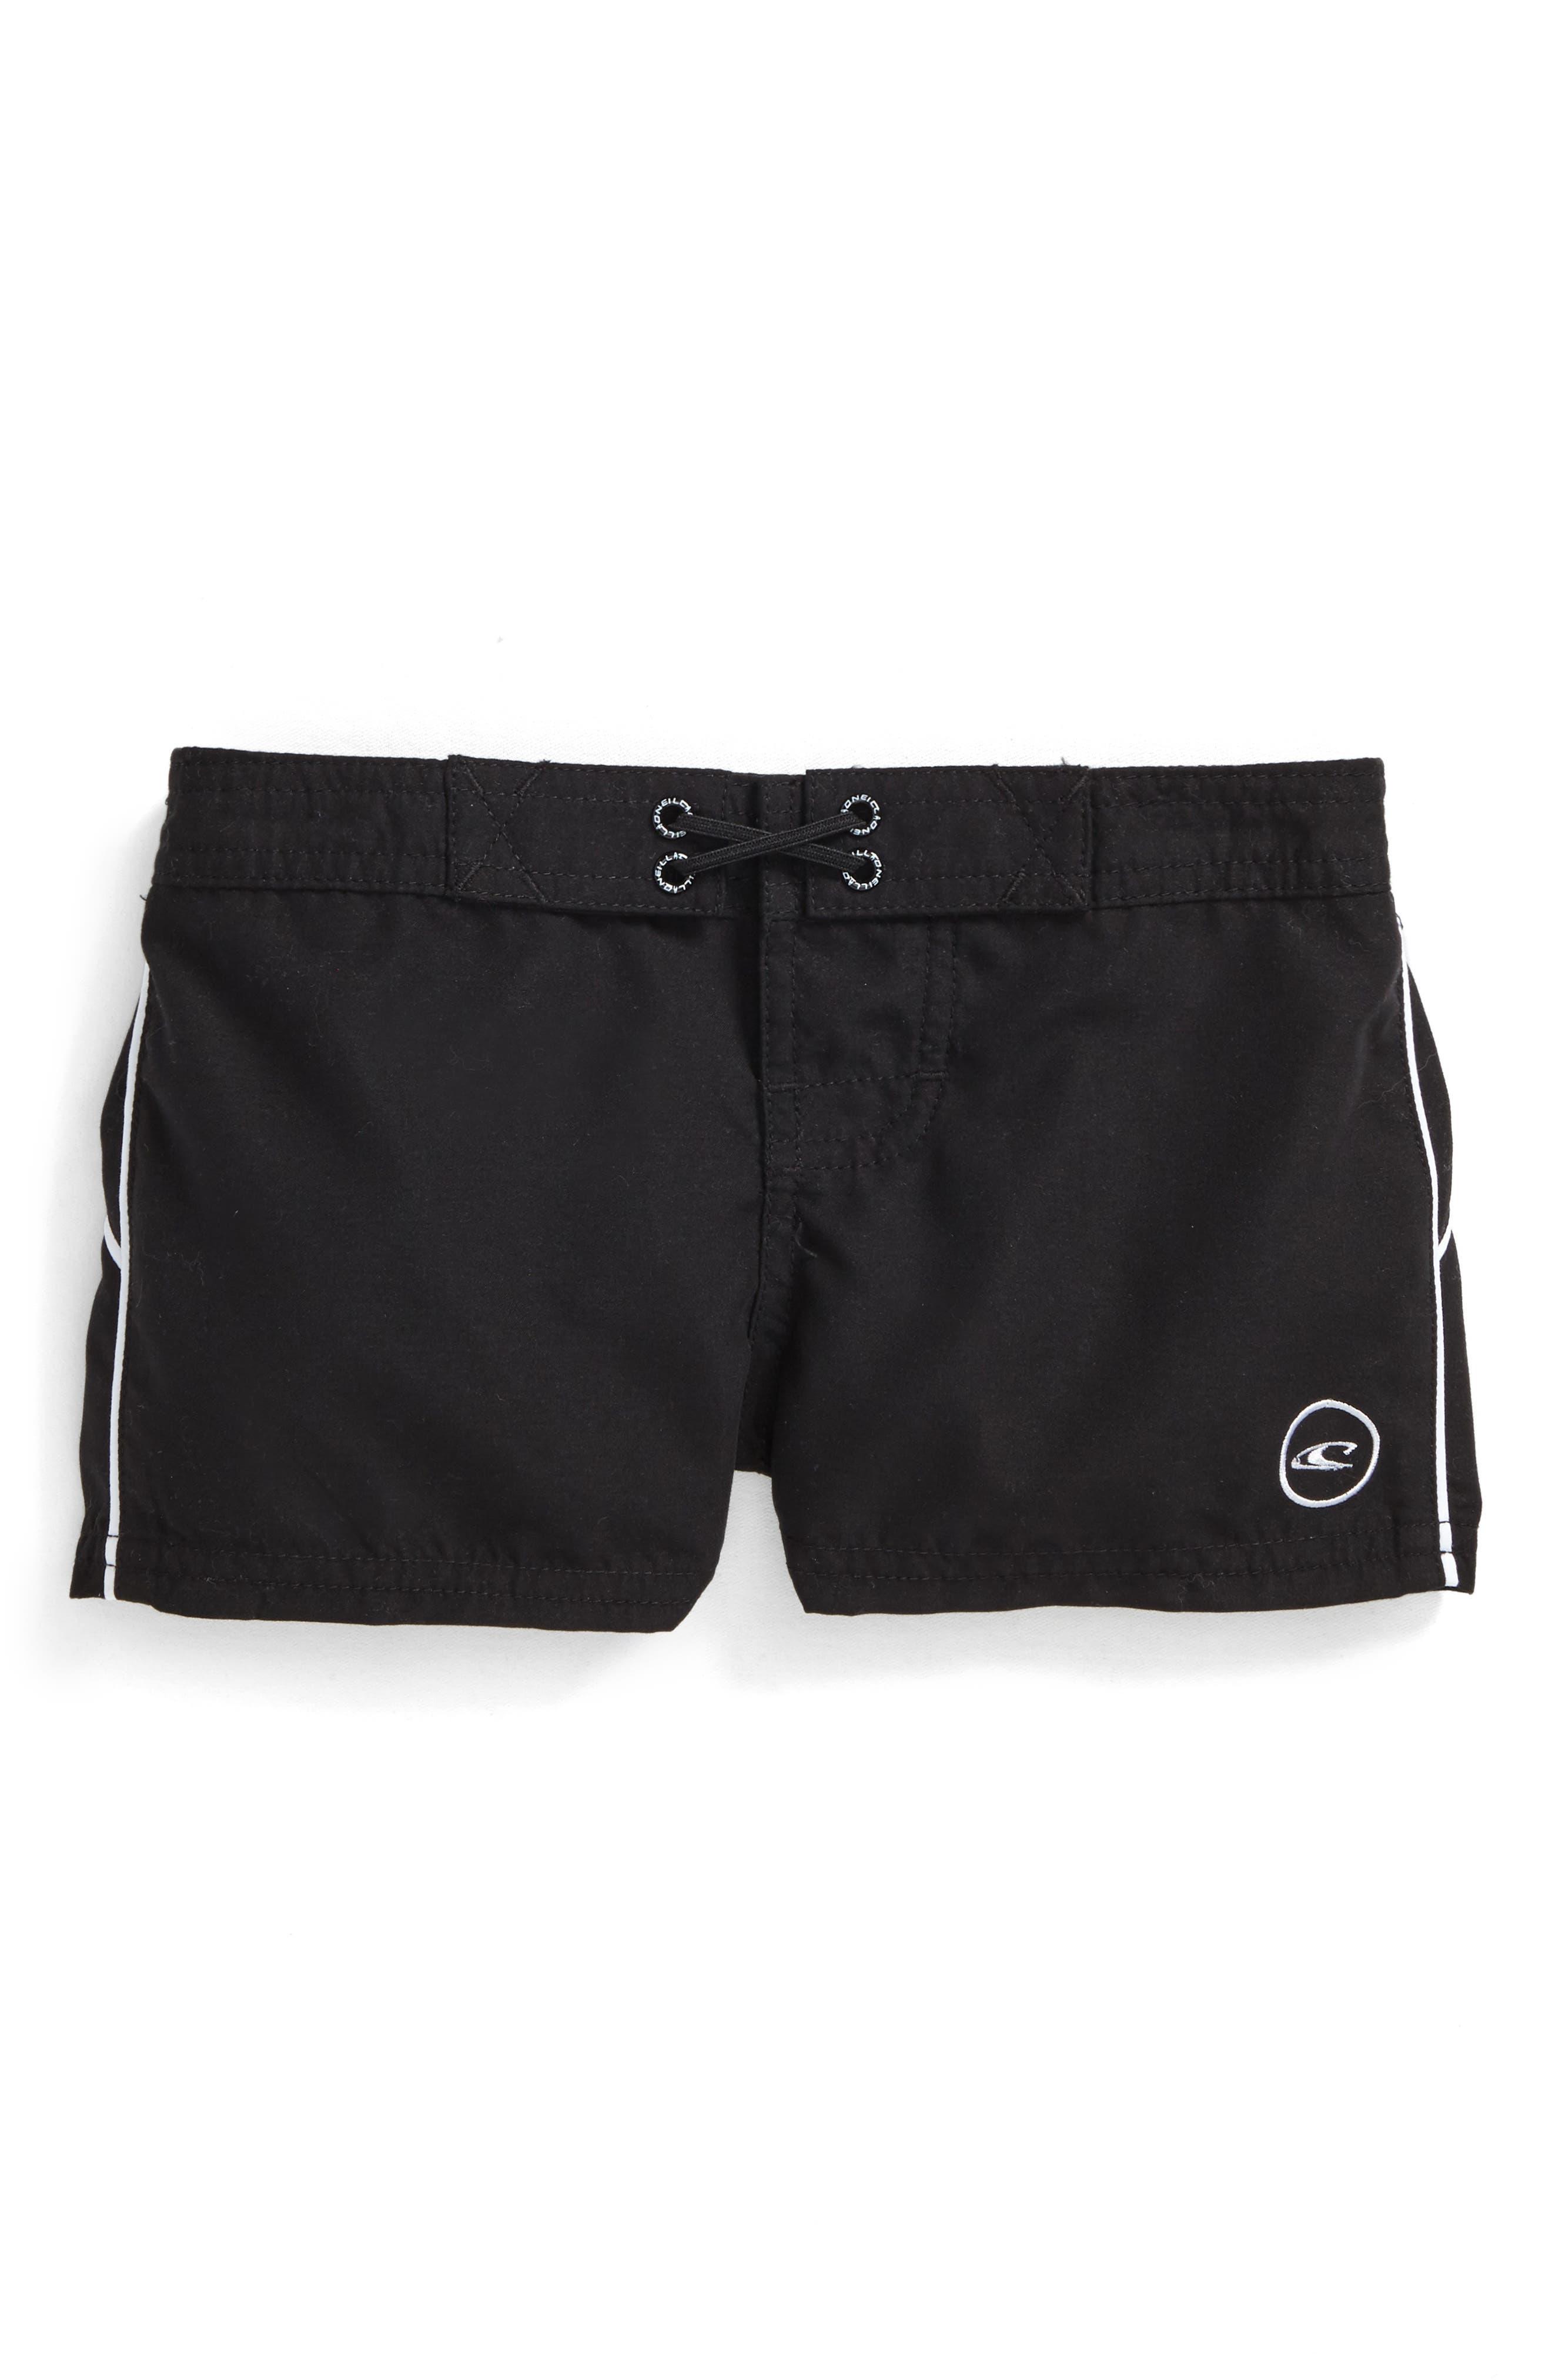 Salt Water Board Shorts,                             Main thumbnail 1, color,                             Black - Blk